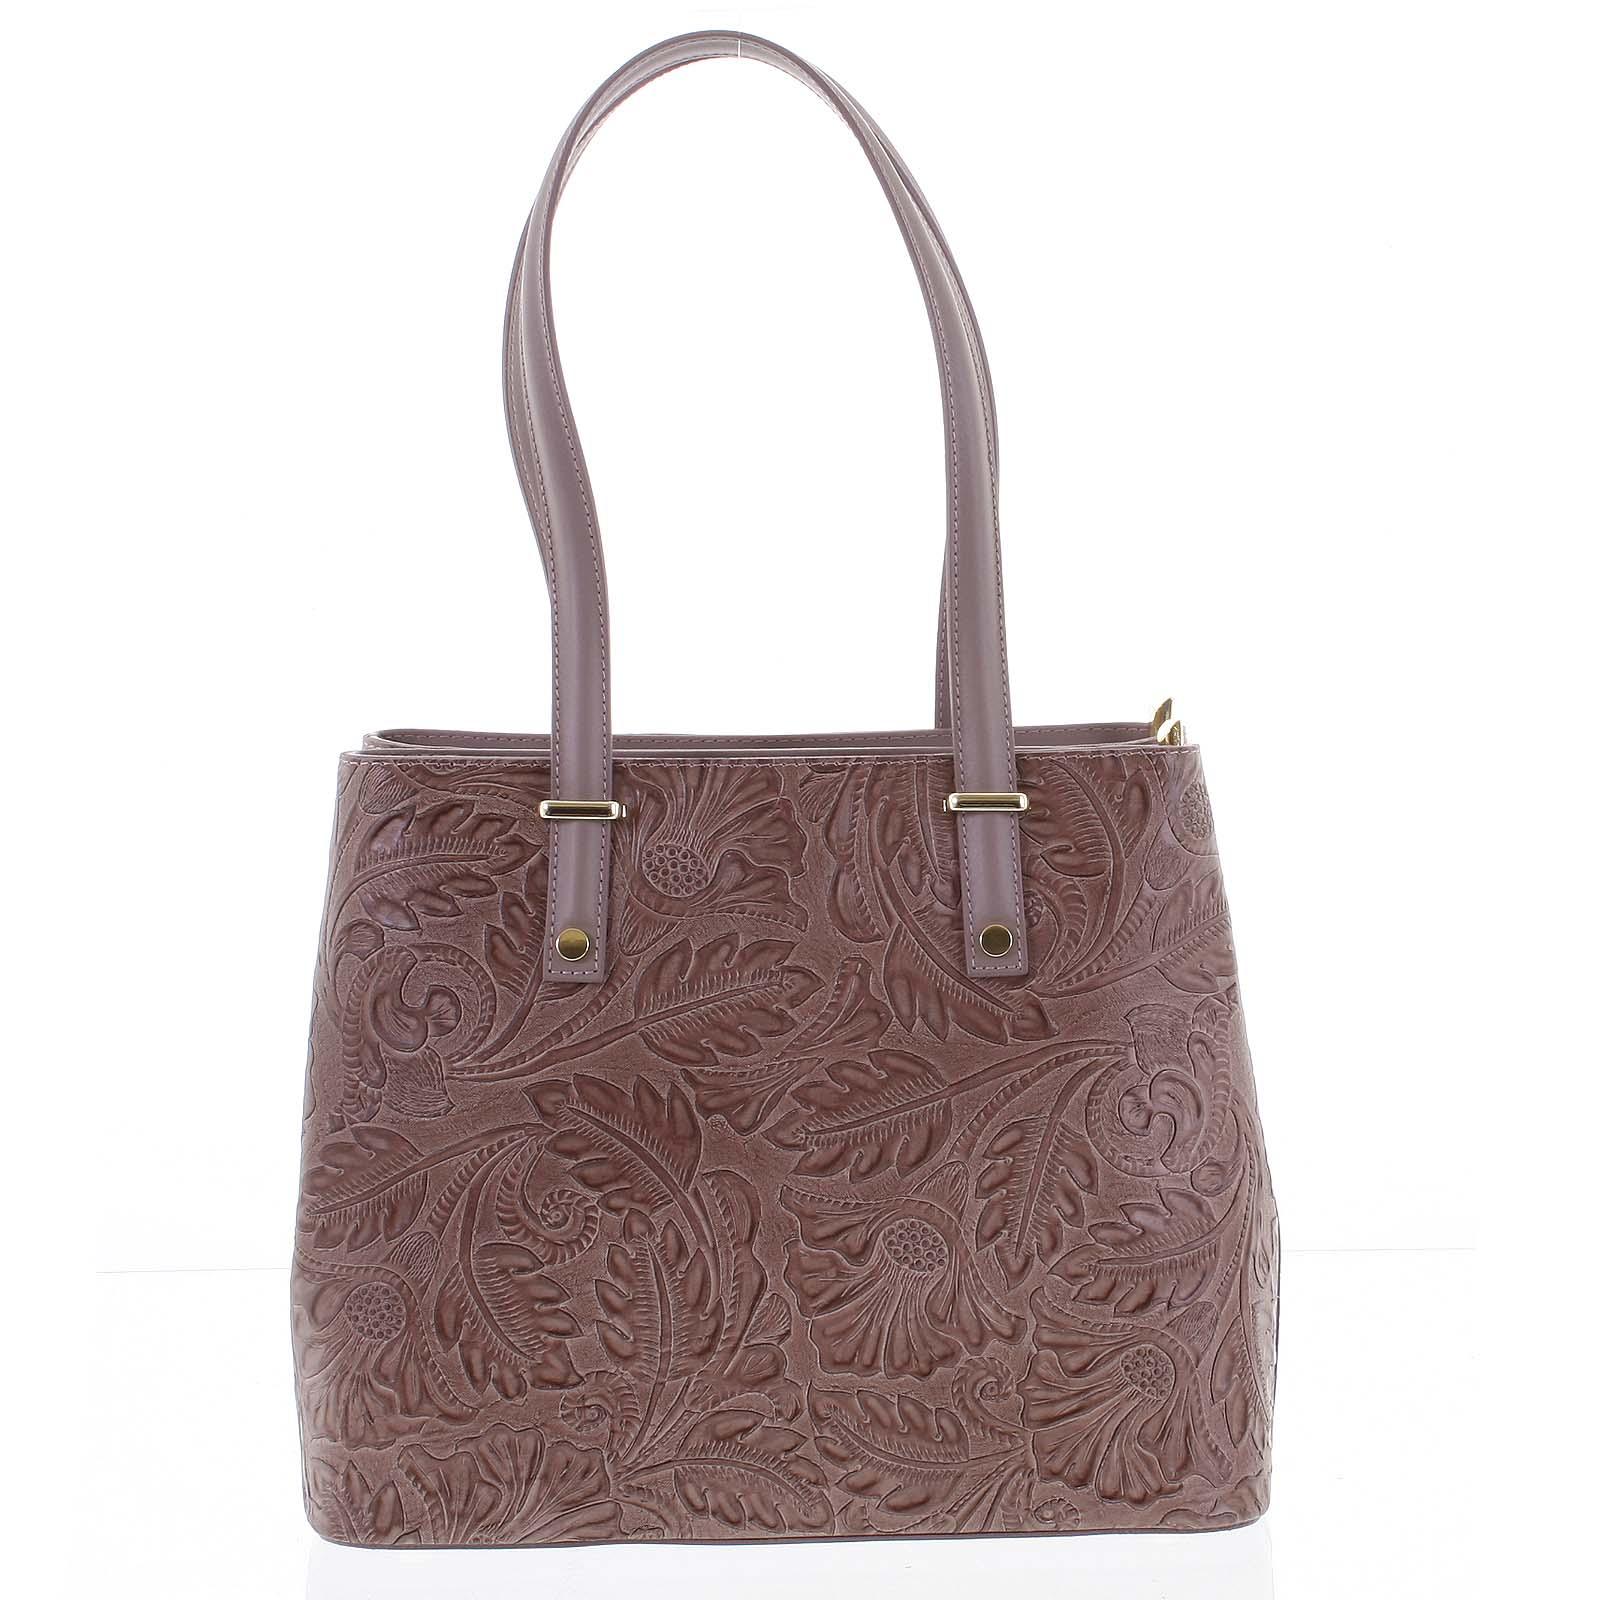 Exkluzívna dámska kožená kabelka tmavoružová - ItalY Logistilla ružová